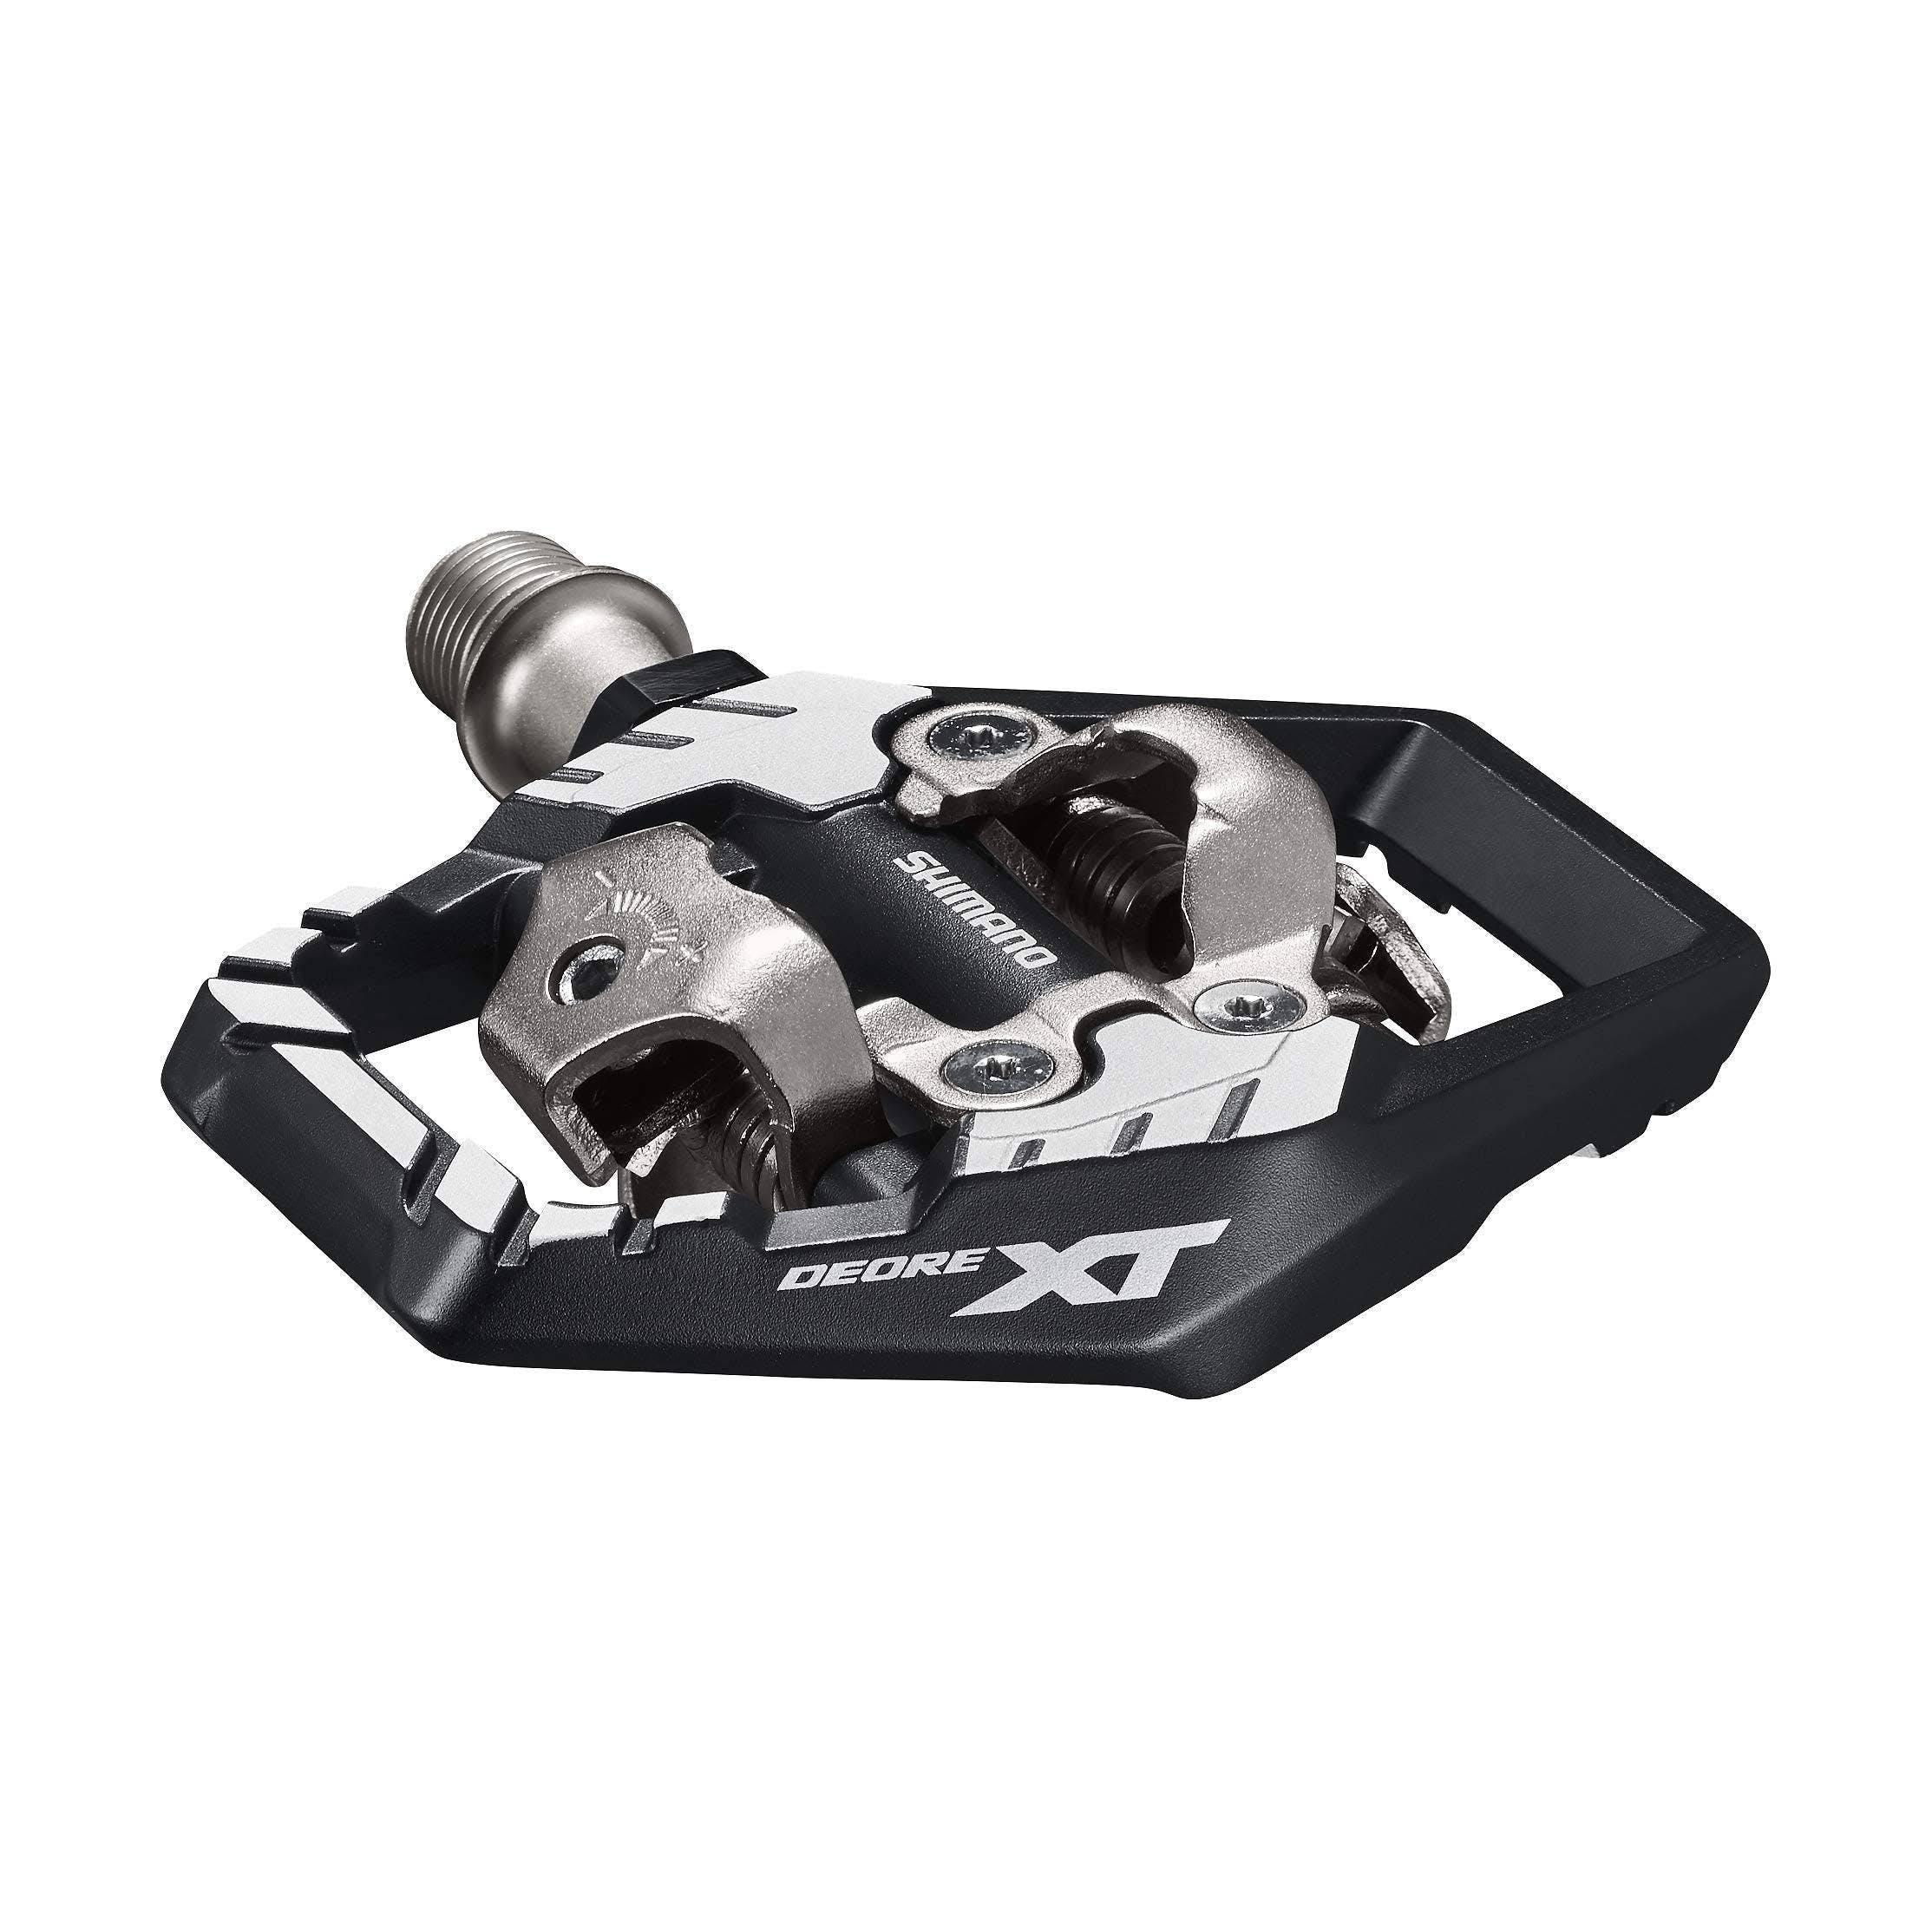 Shimano XT PD-M8120 SPD Pedals